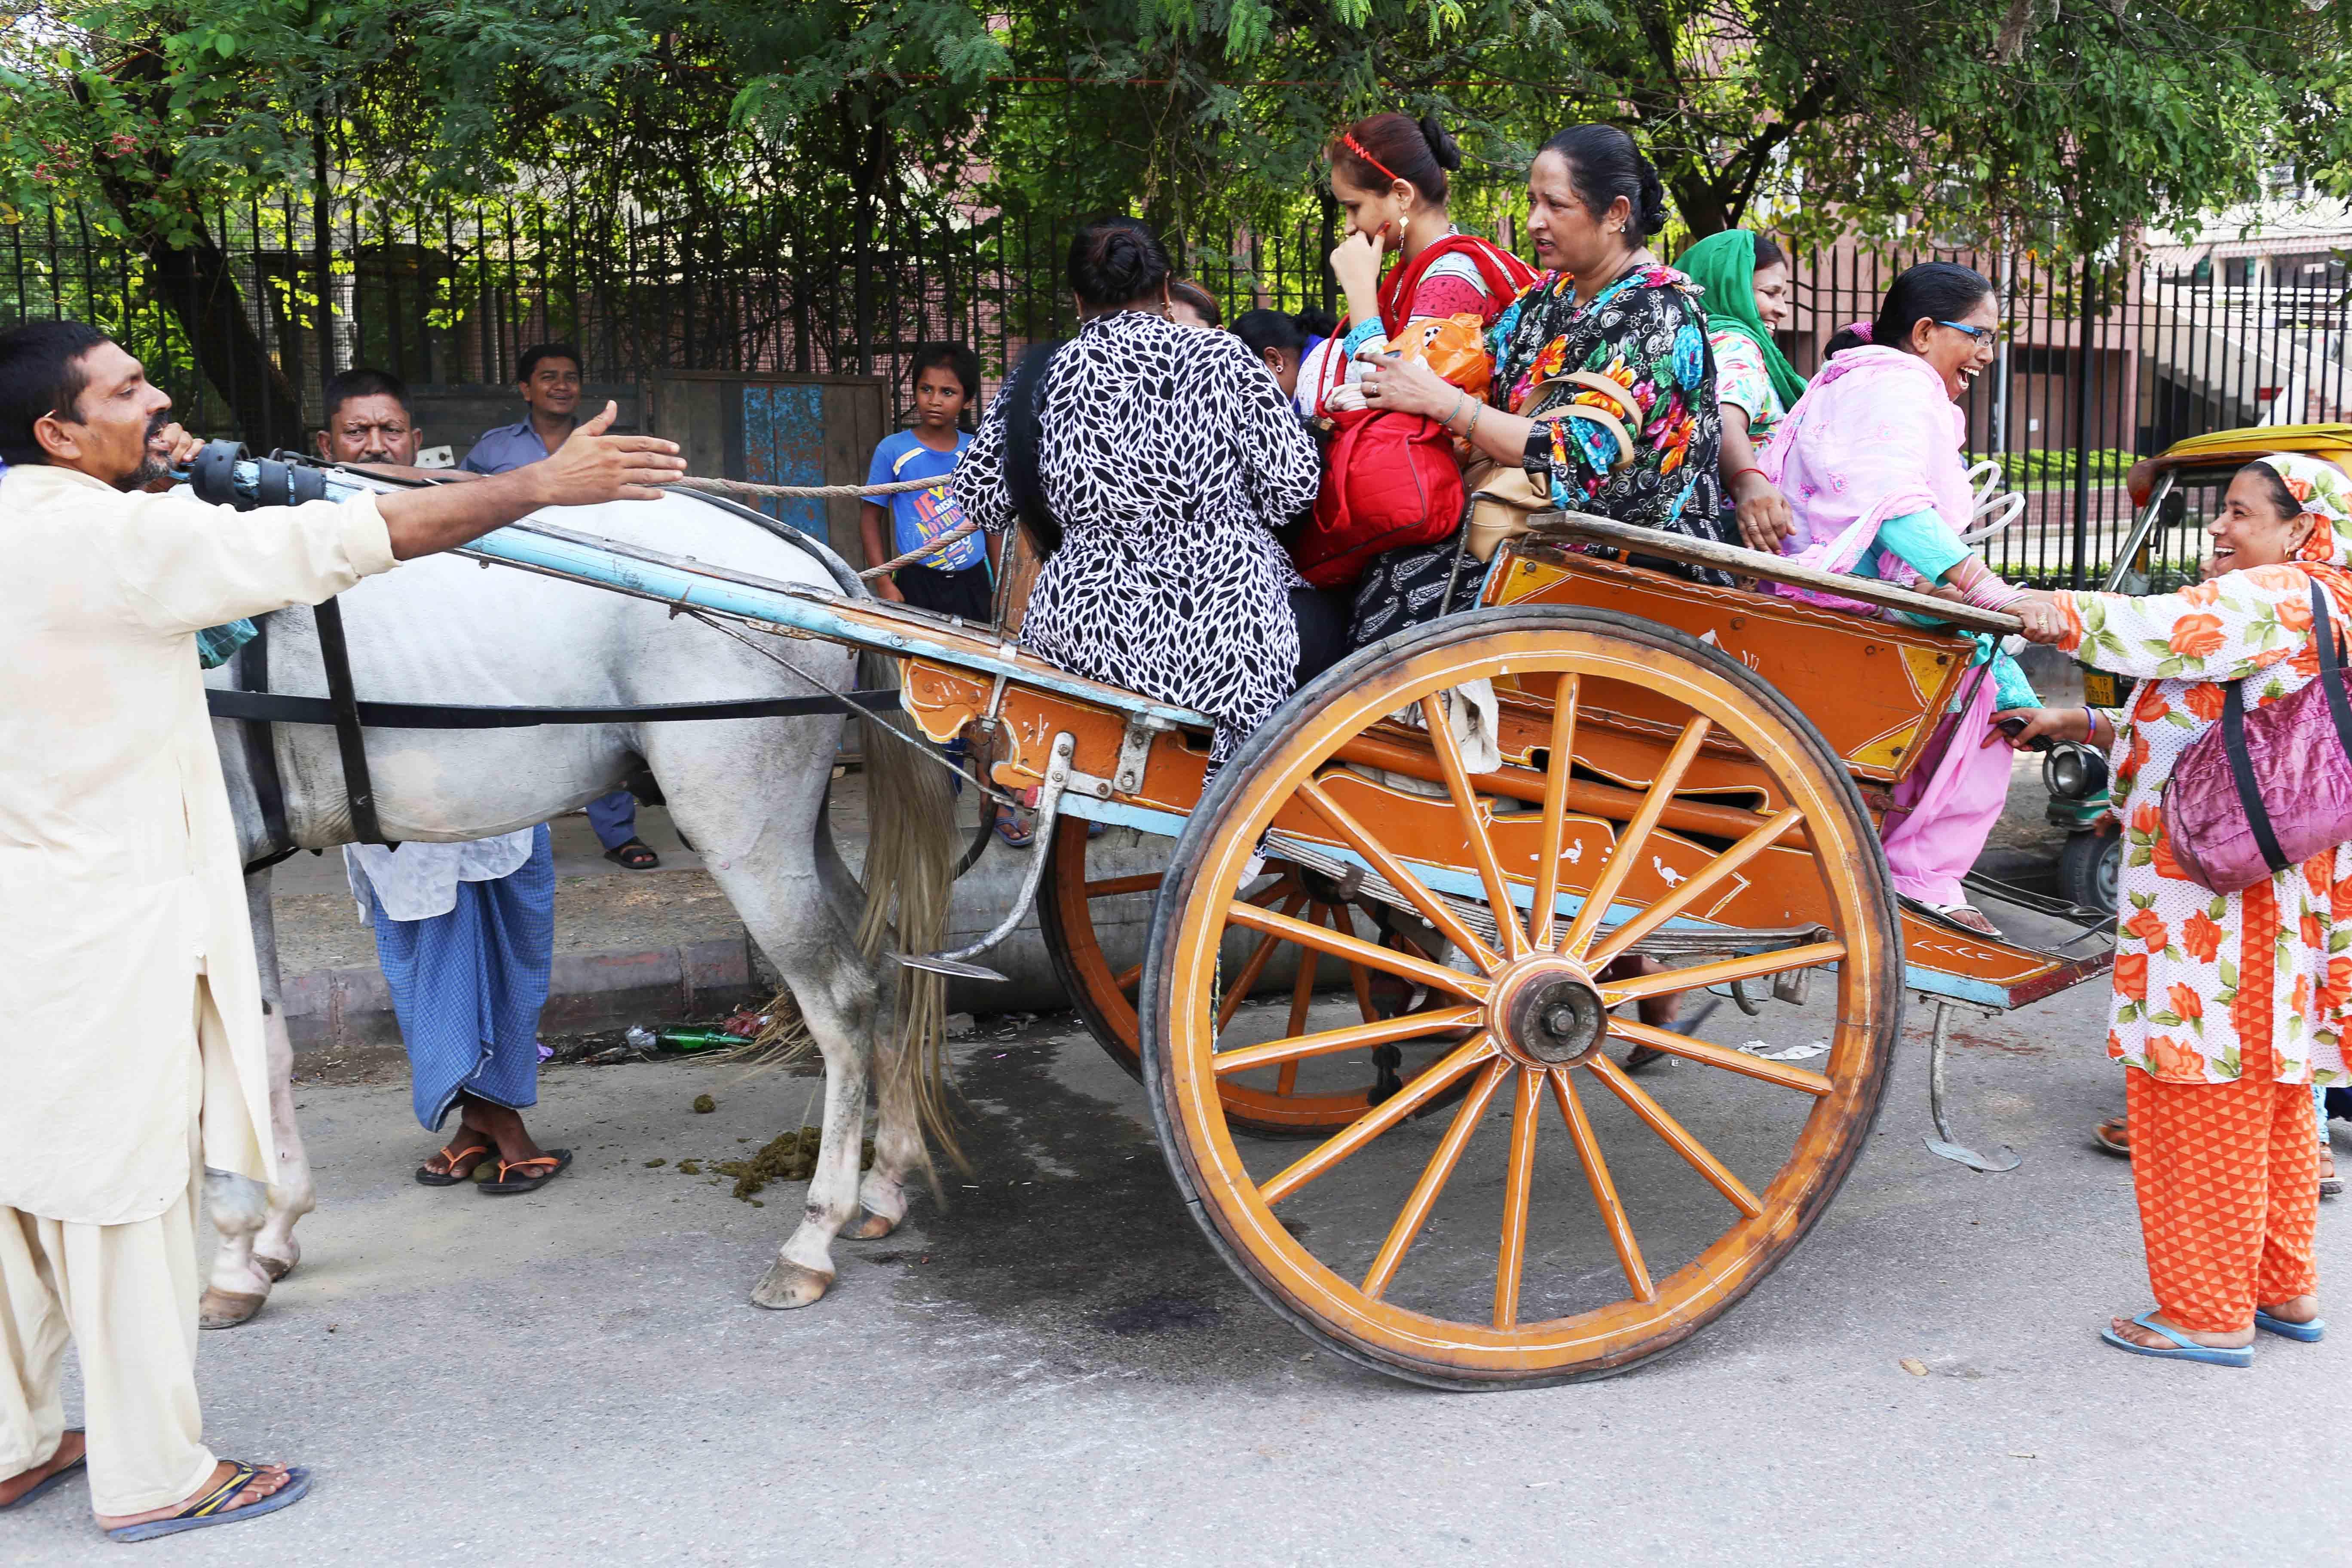 City Moment - Tonga Riders, Outside Zakir Husain Delhi College